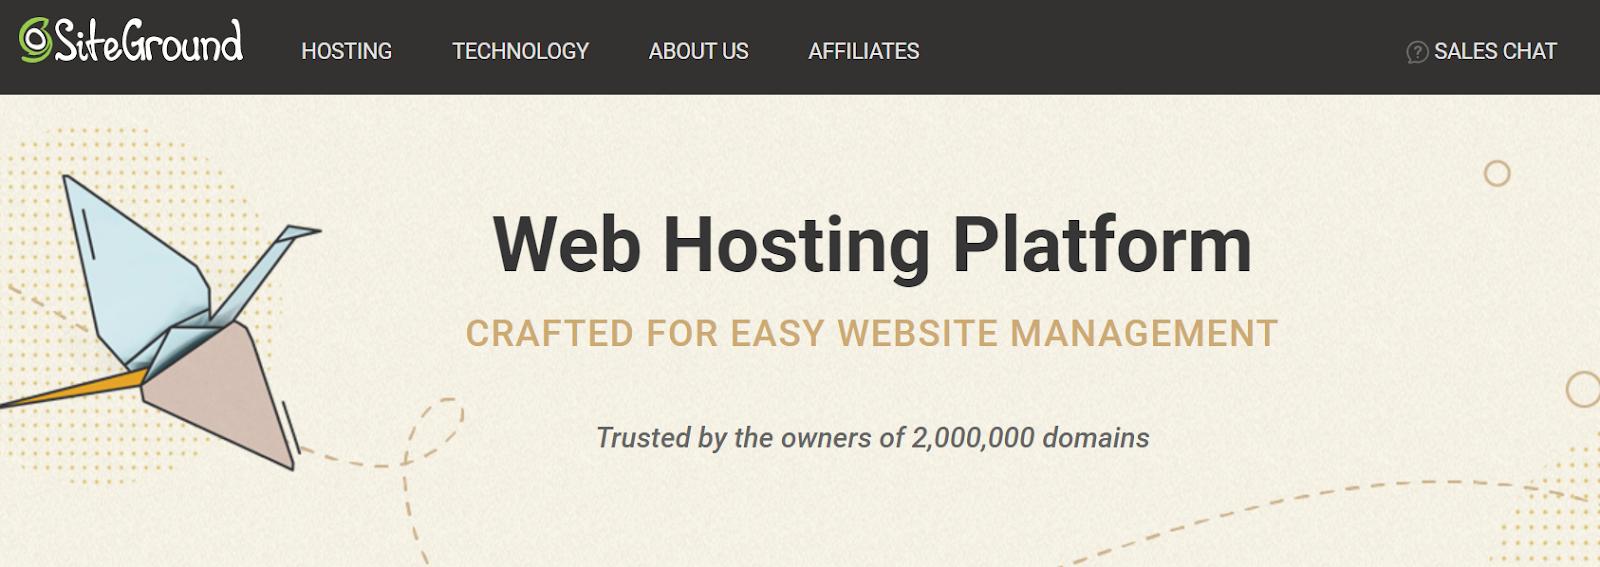 SiteGround hosting platform